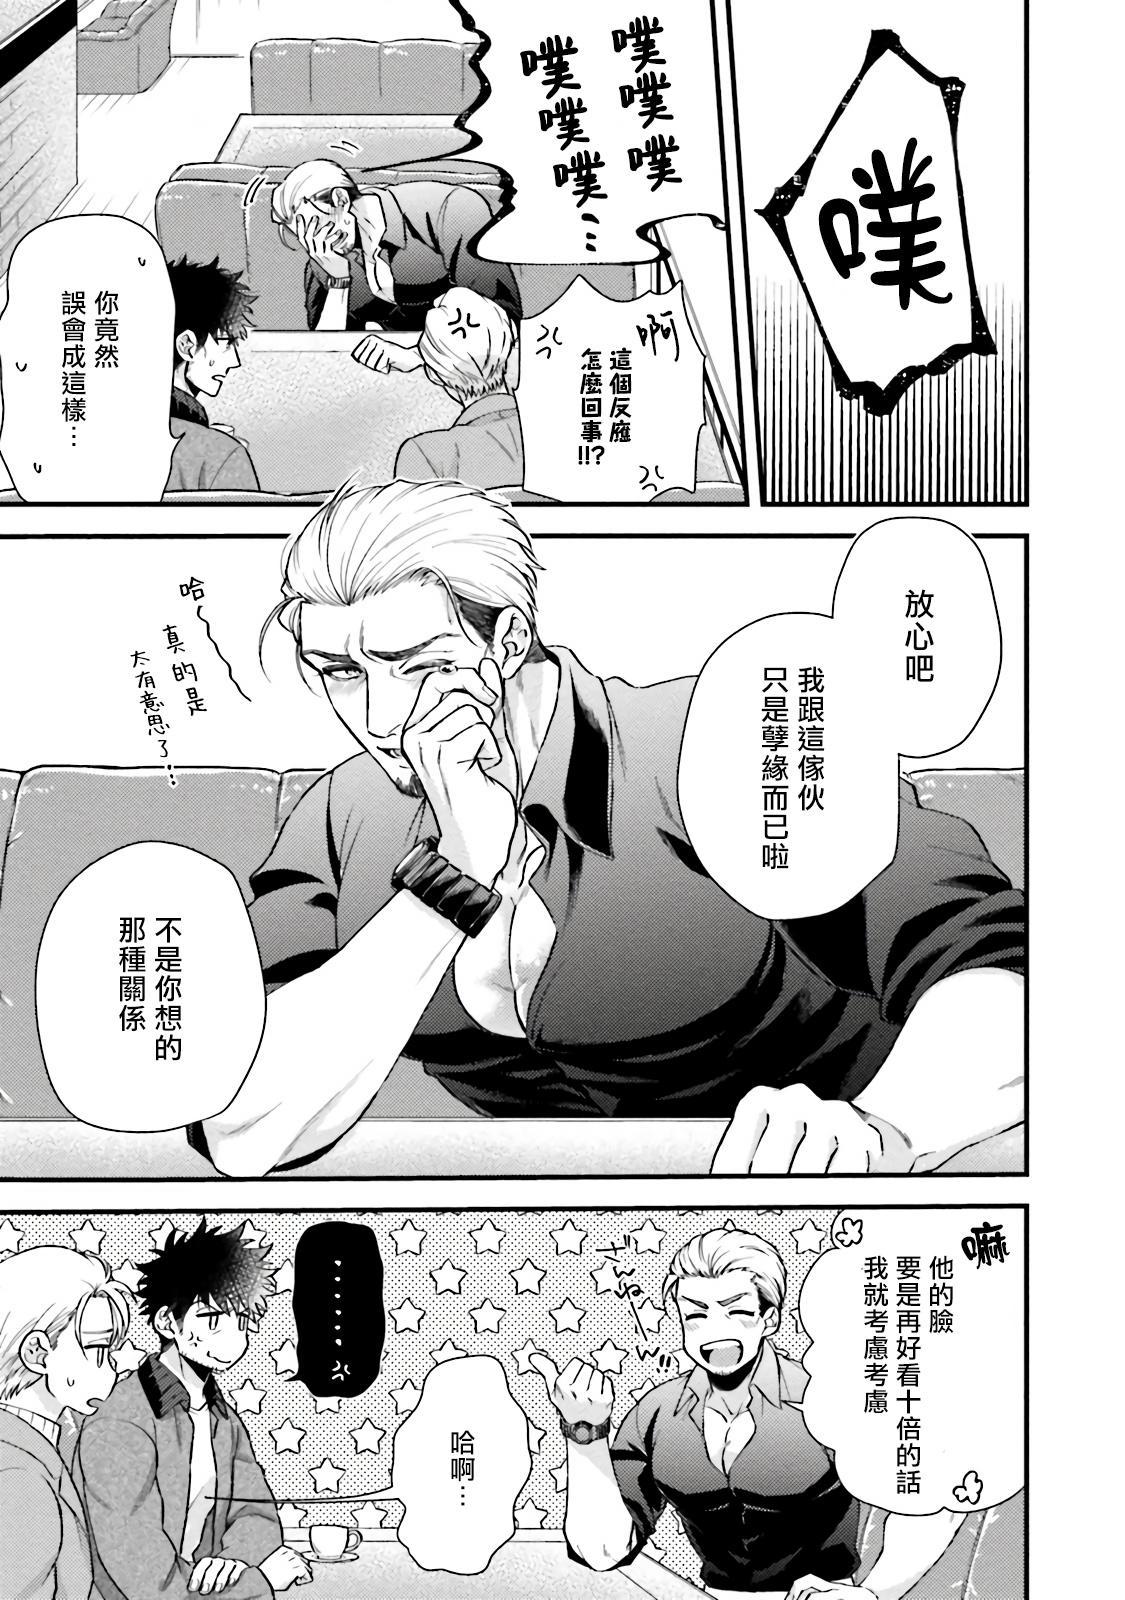 Kinou wa Otanoshimi Deshita ne | 昨天过得很愉快吧 Ch. 1-4+特典 173